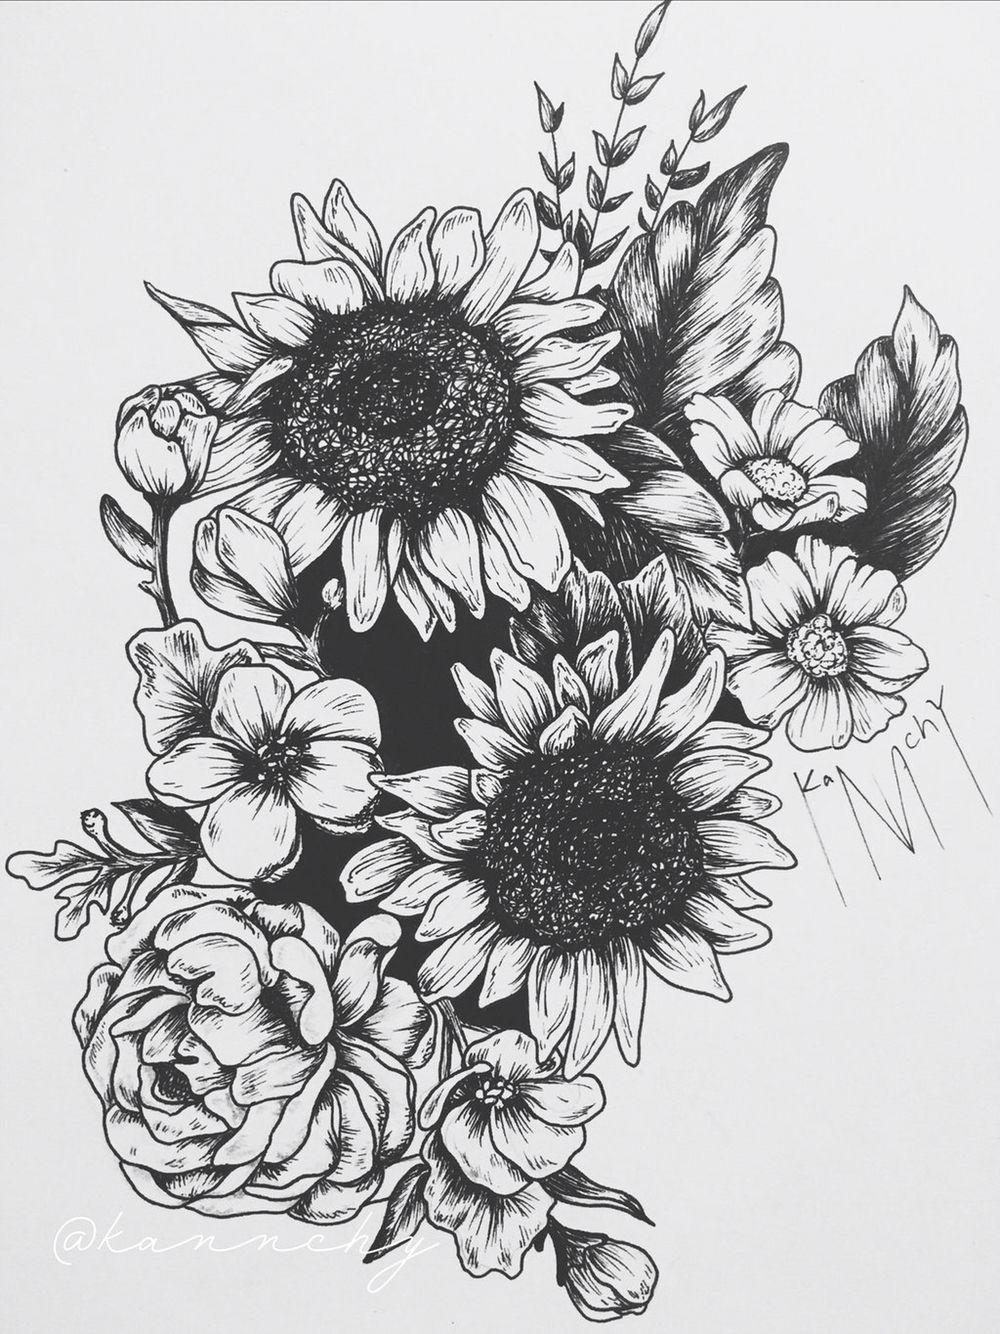 Sleeve Sunflower Tattoos Sunflower Tattoo Sleeve Sunflower Tattoo